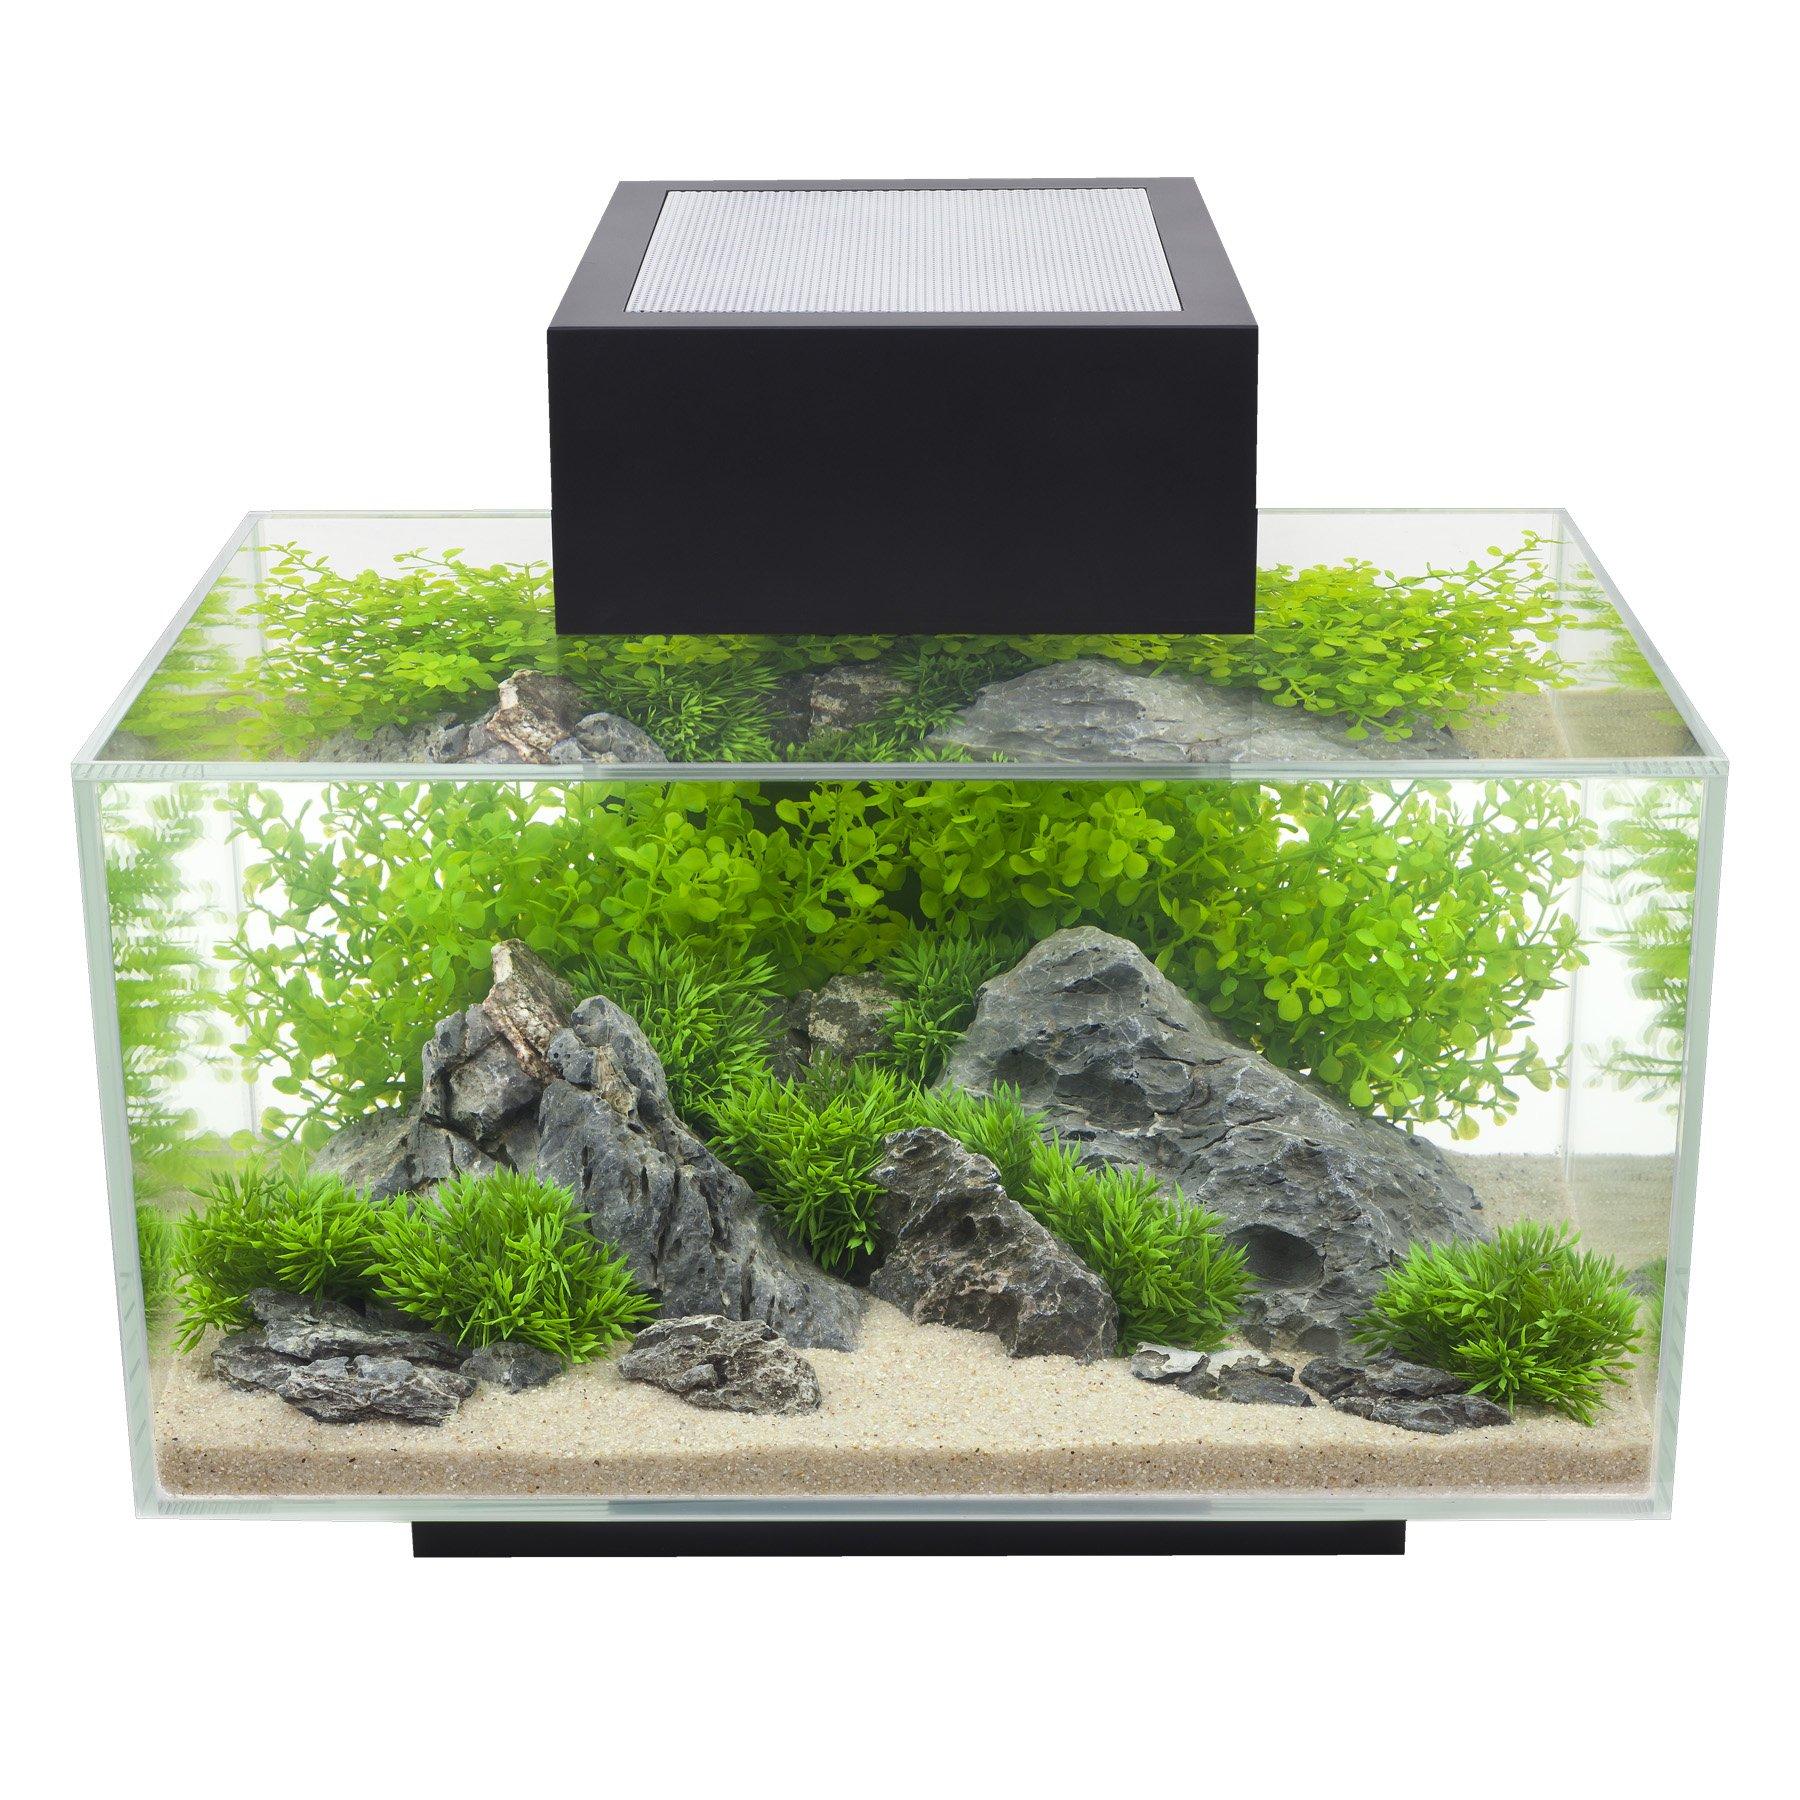 Fluval Edge 6-Gallon Aquarium with 21-LED Light, Black